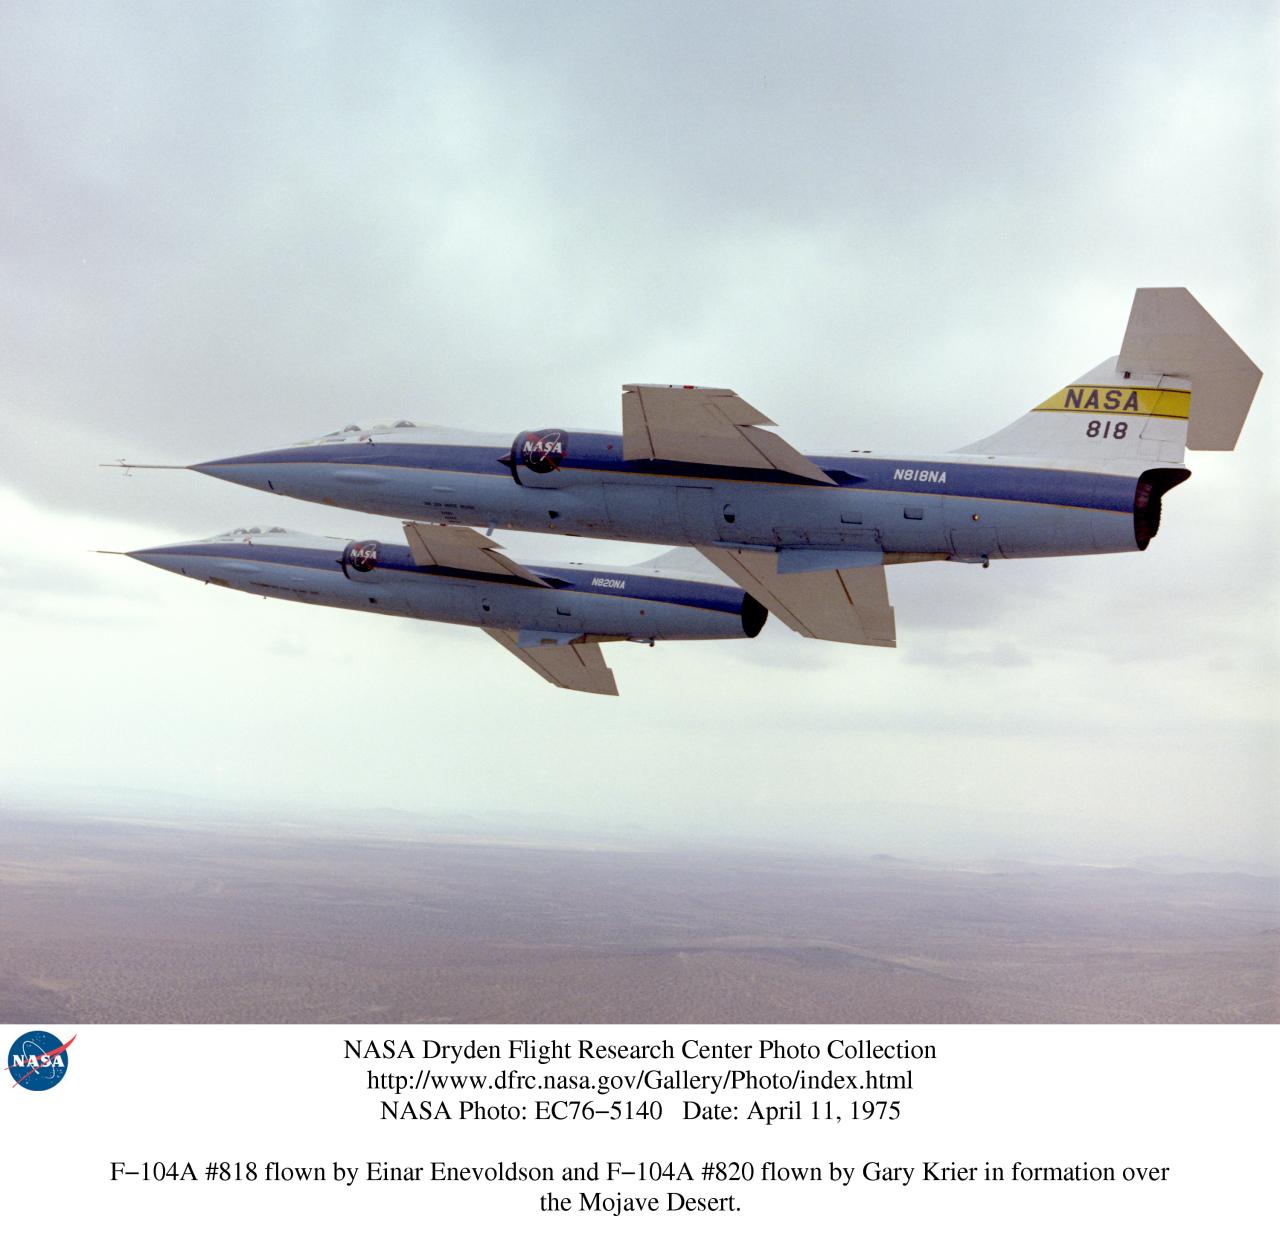 nasa f-104a - photo #29